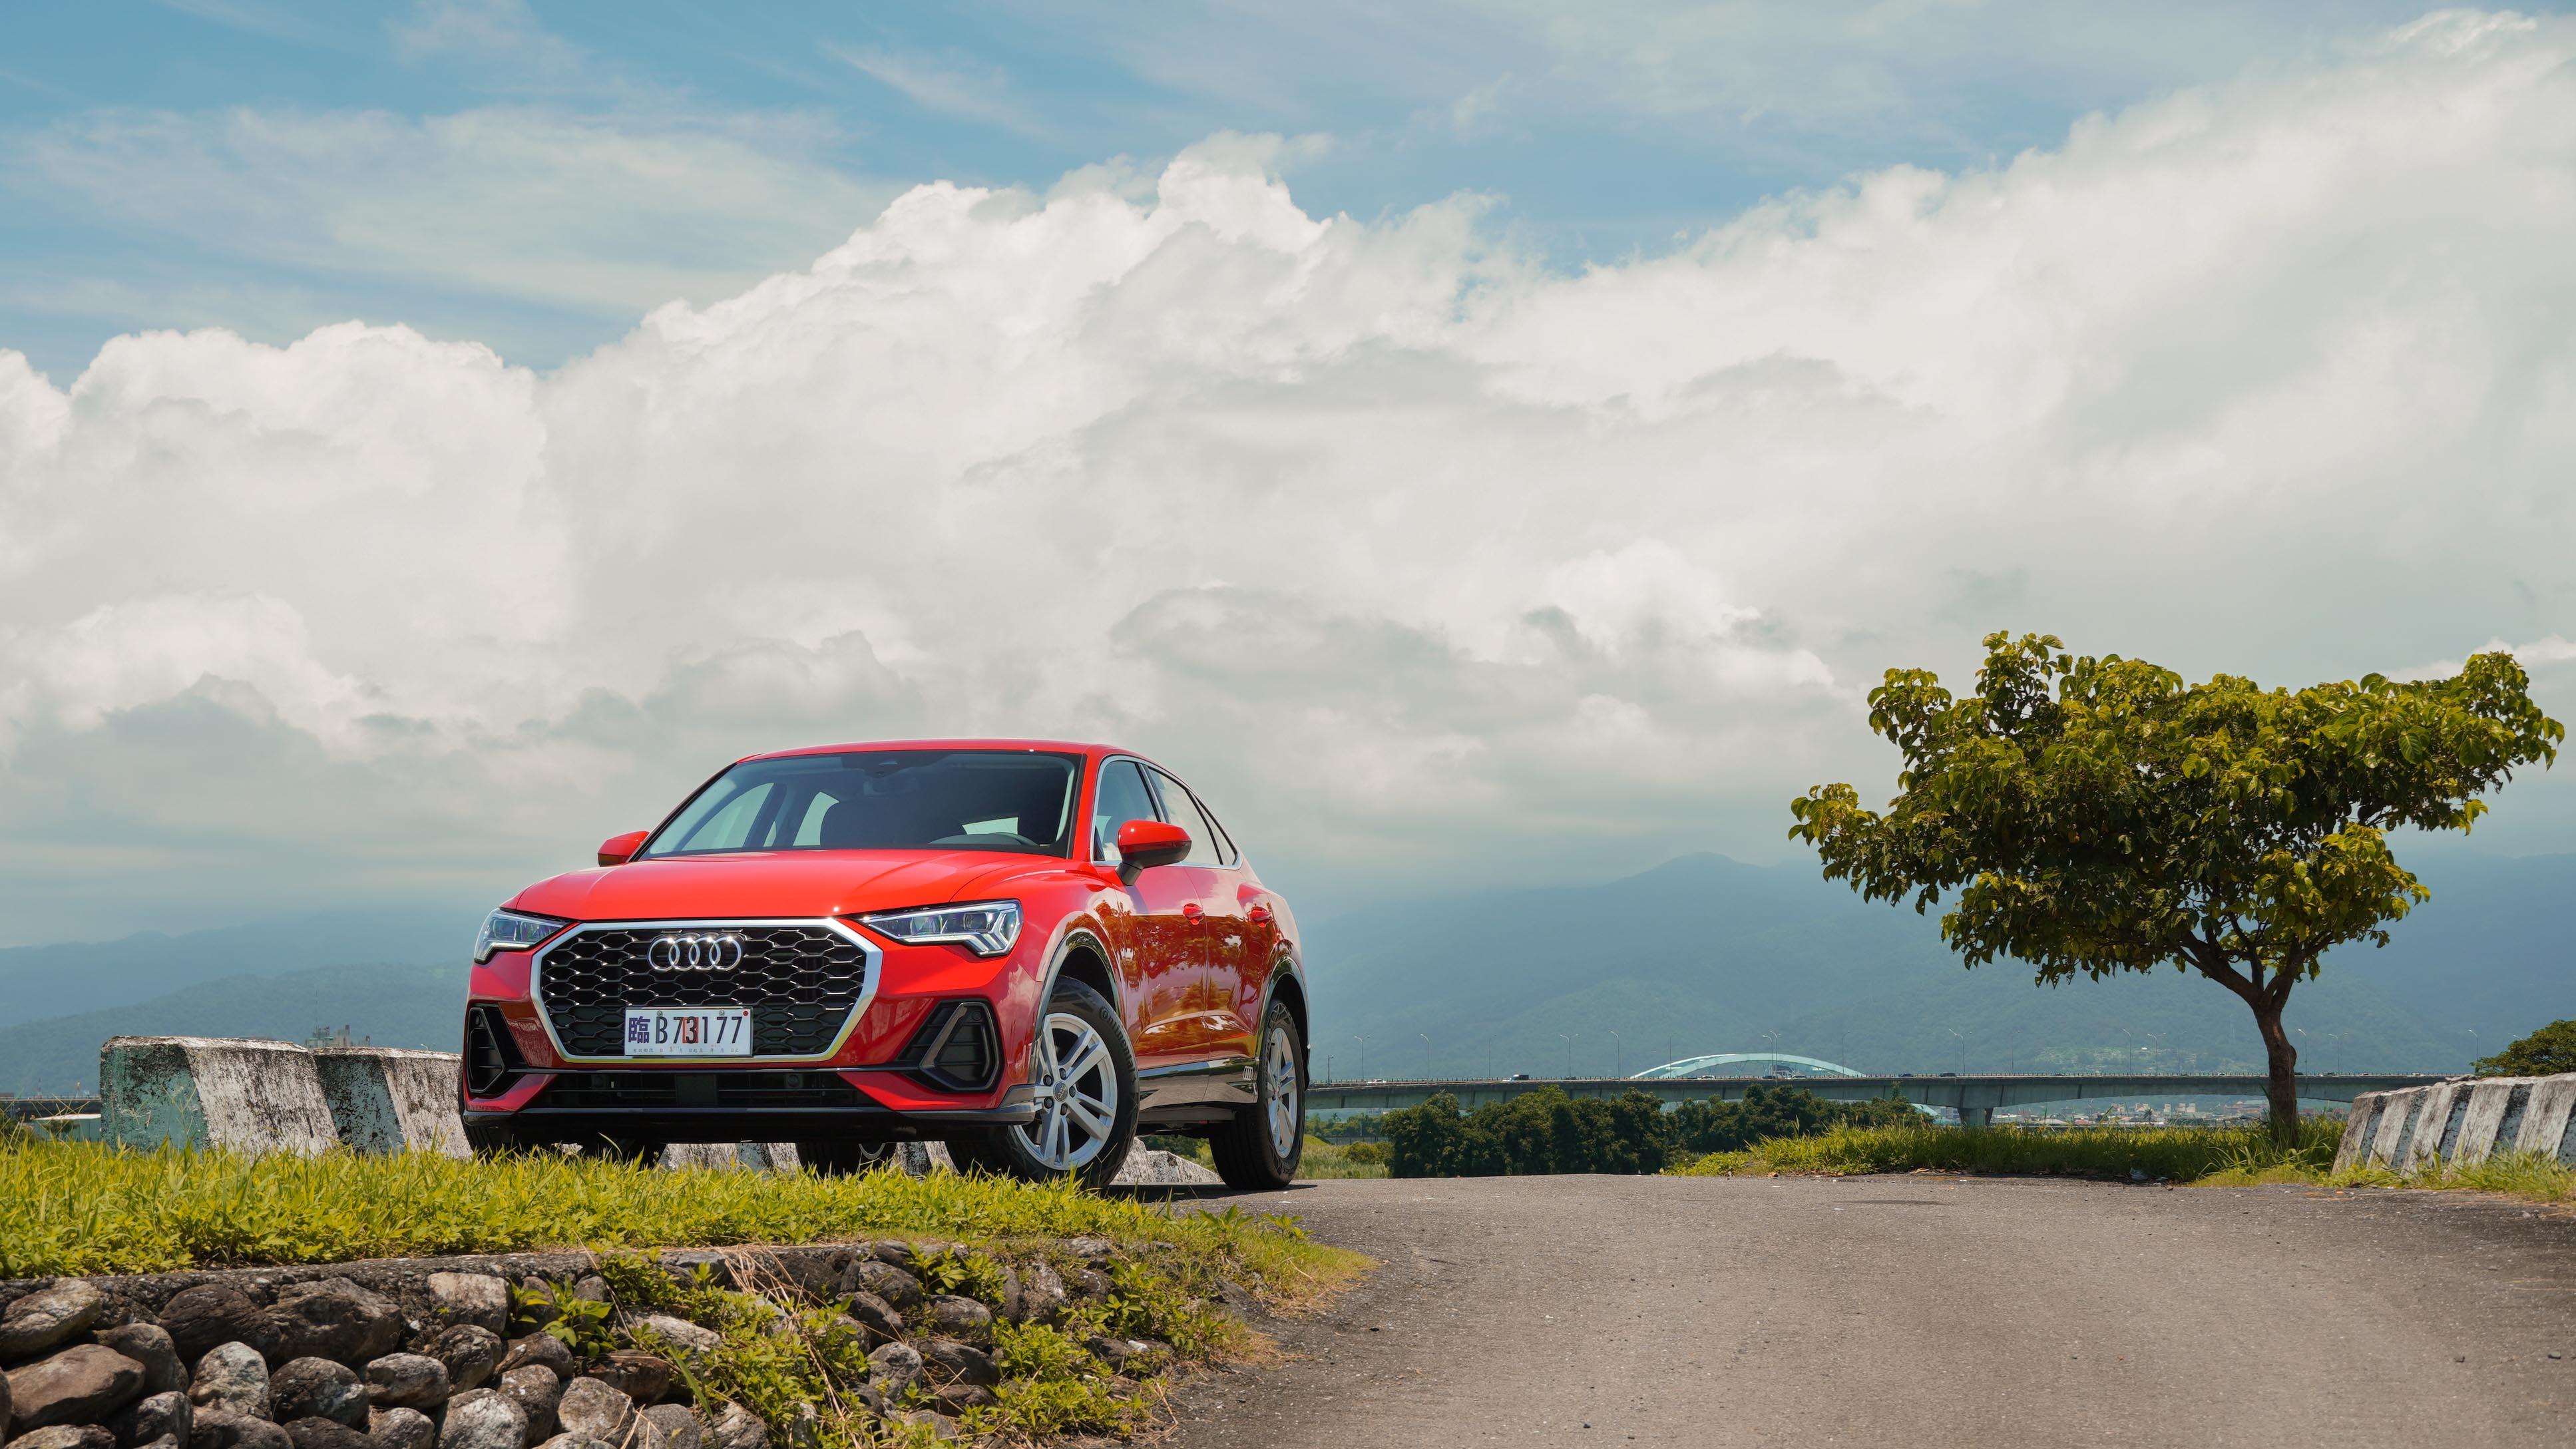 Audi Q3 Sportback 35 TFSI、35 TFSI S line 售價分別為 191 萬元及 208 萬元。